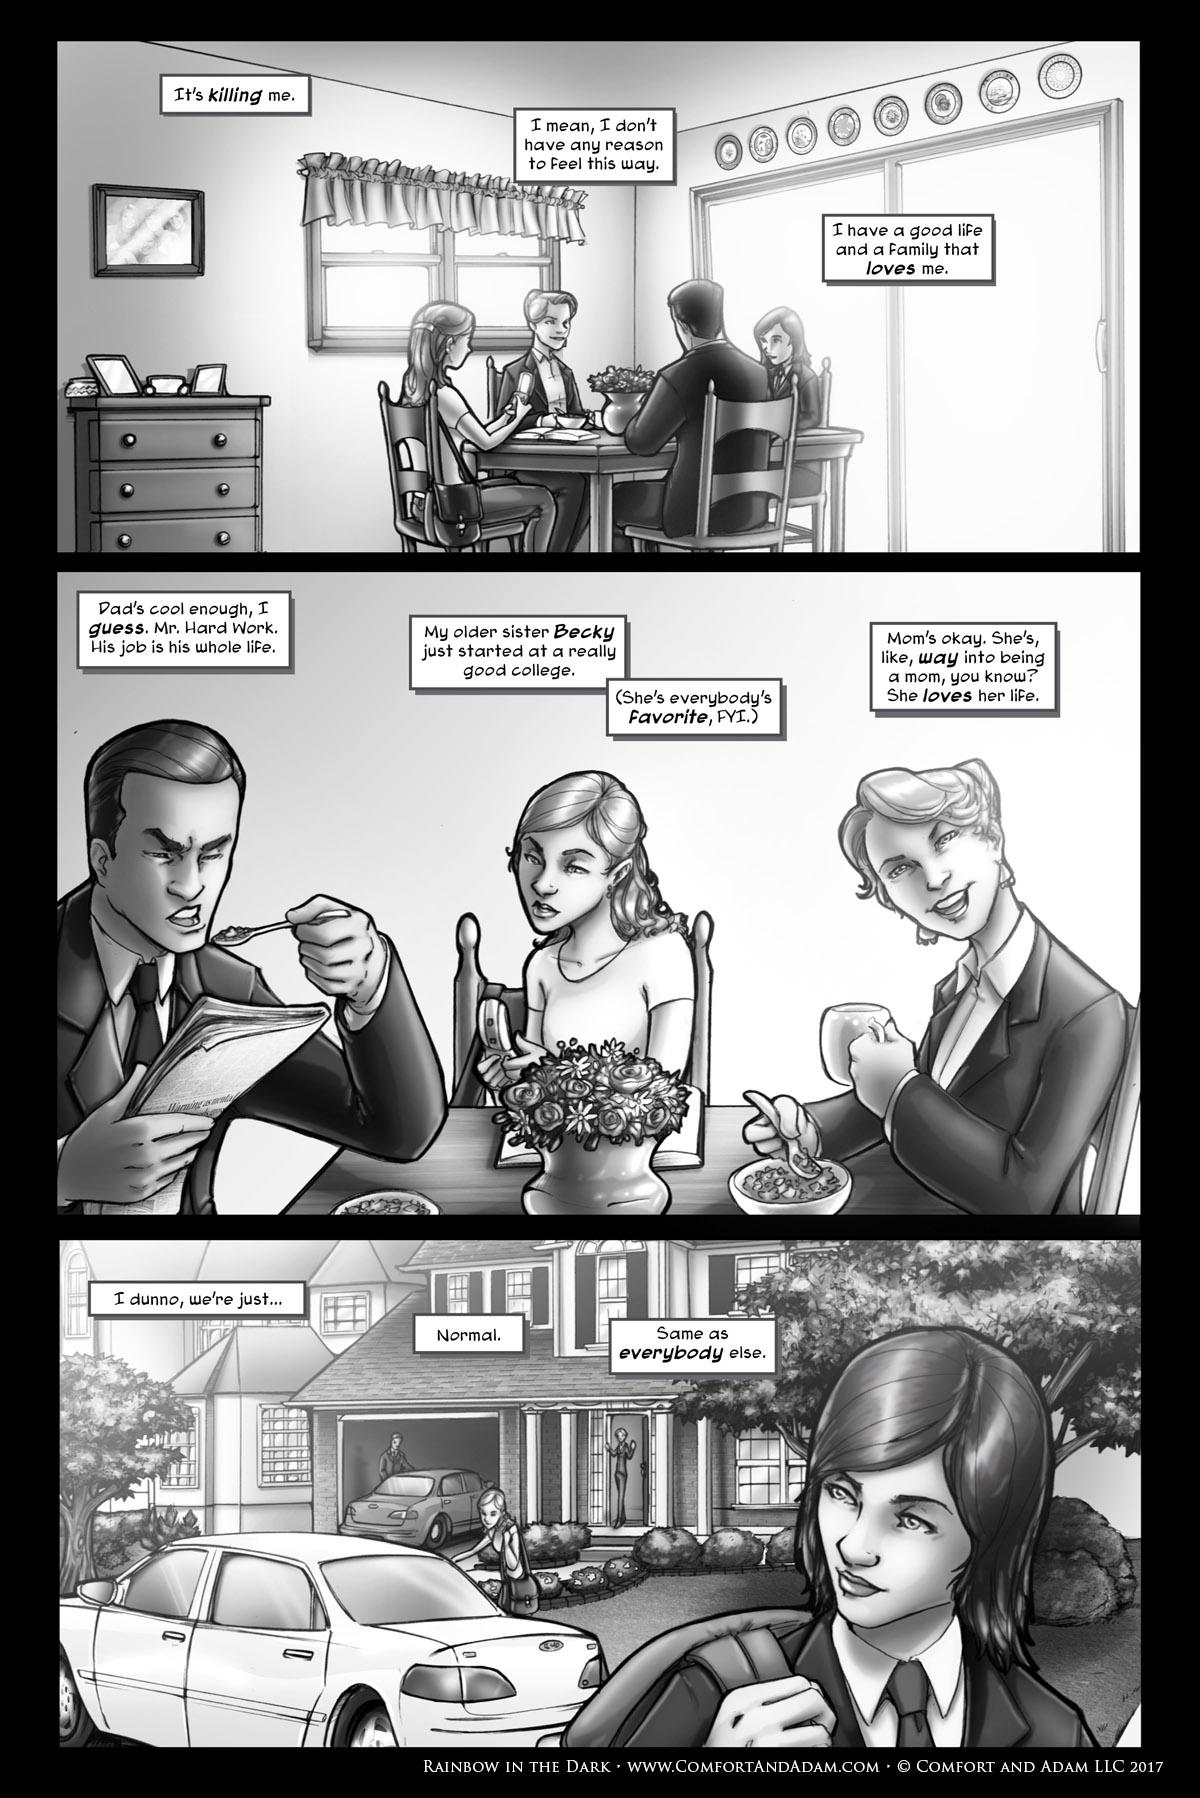 Rainbow in the Dark #1, pg. 2: Family Life